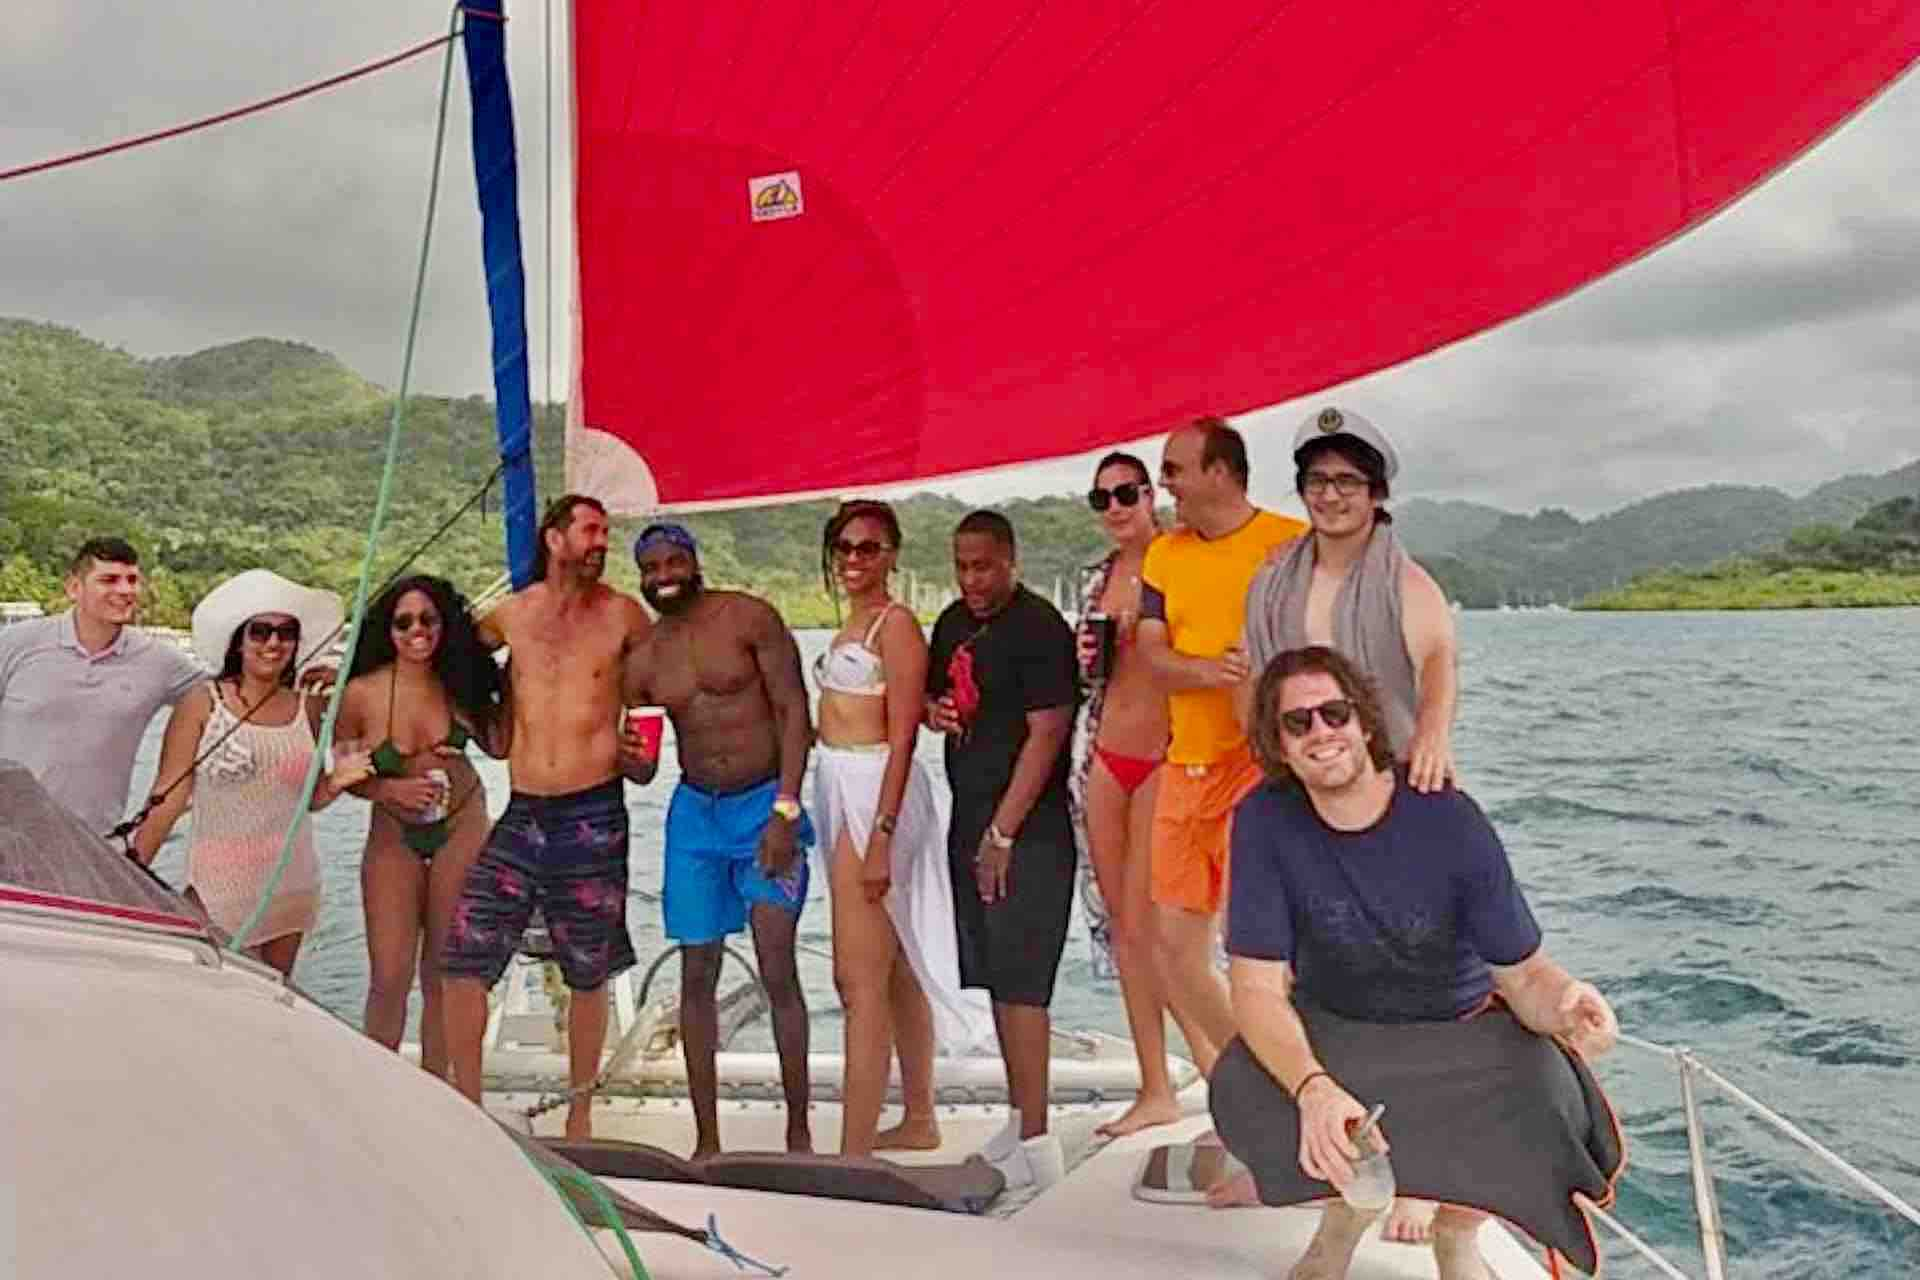 Panama Caribbean tour group photo